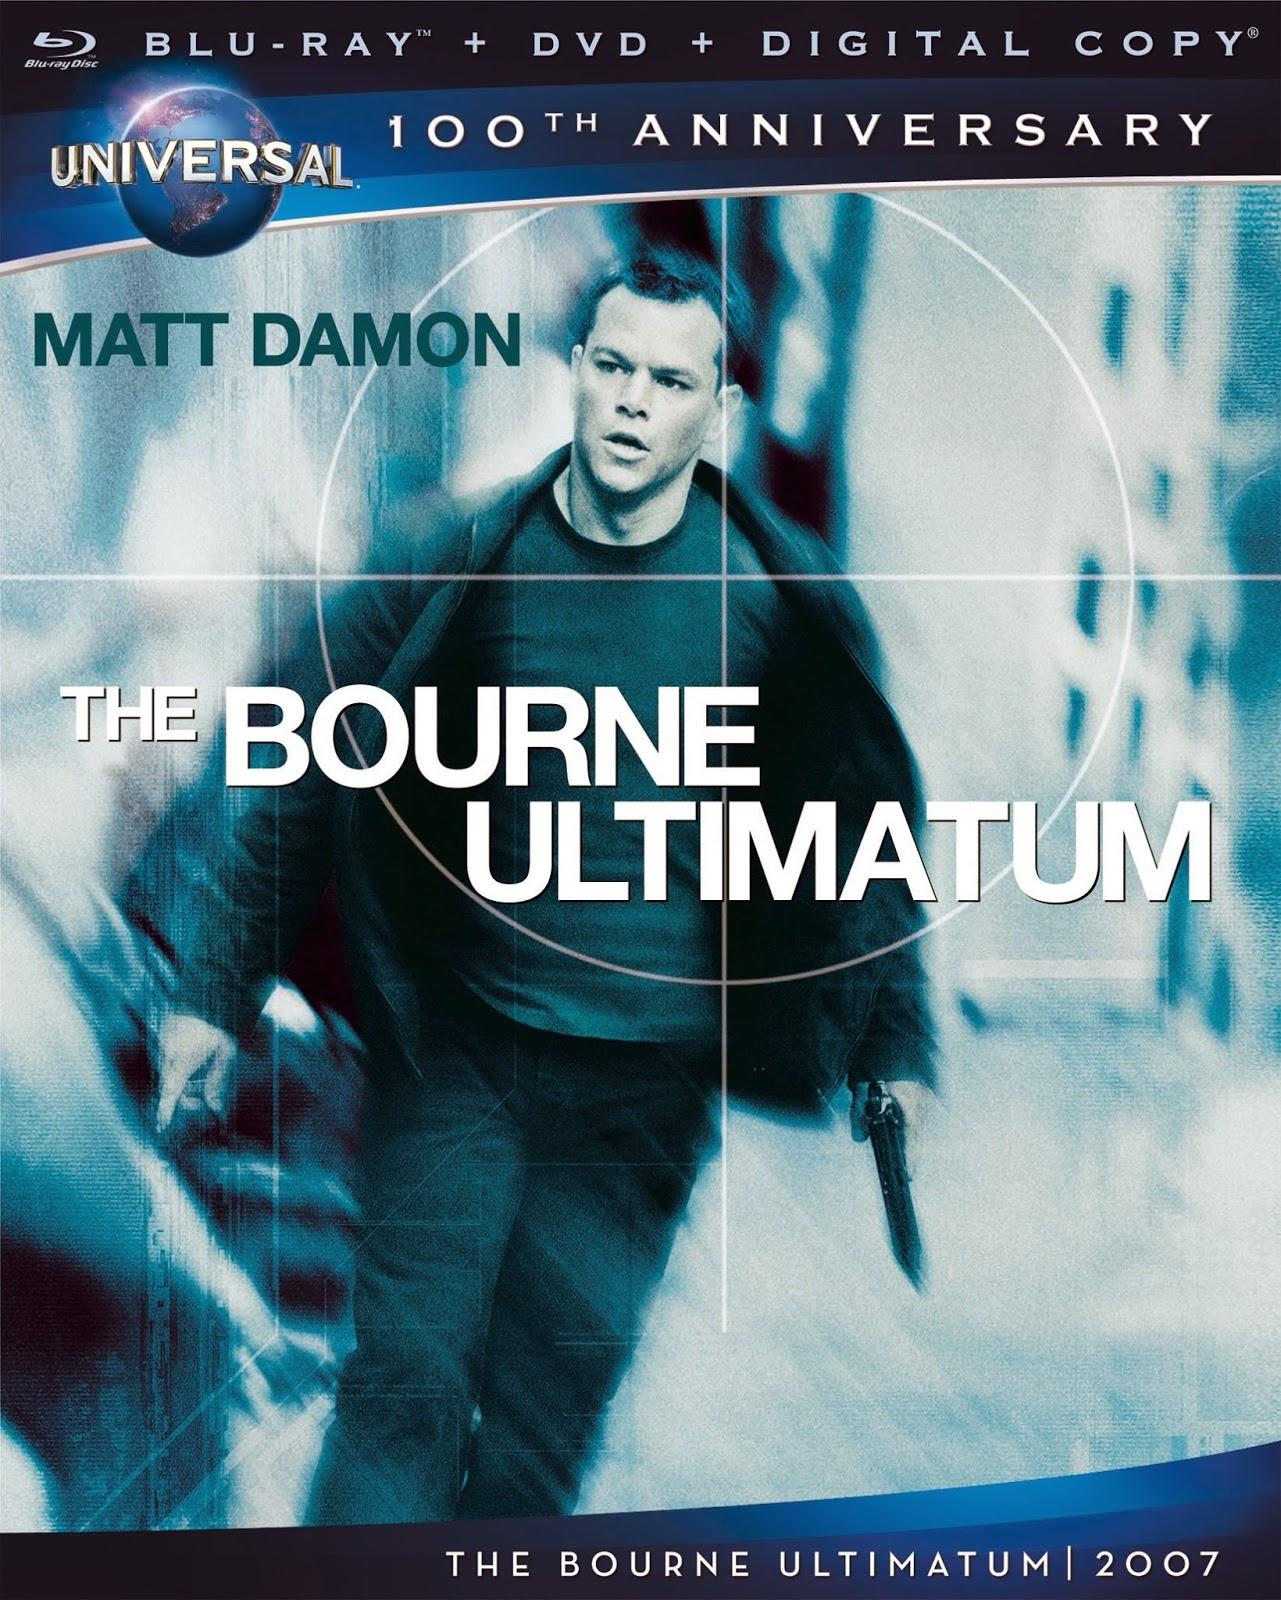 The Bourne Ultimatum - Το Τελεσίγραφο του Μπορν (2007) ταινιες online seires oipeirates greek subs